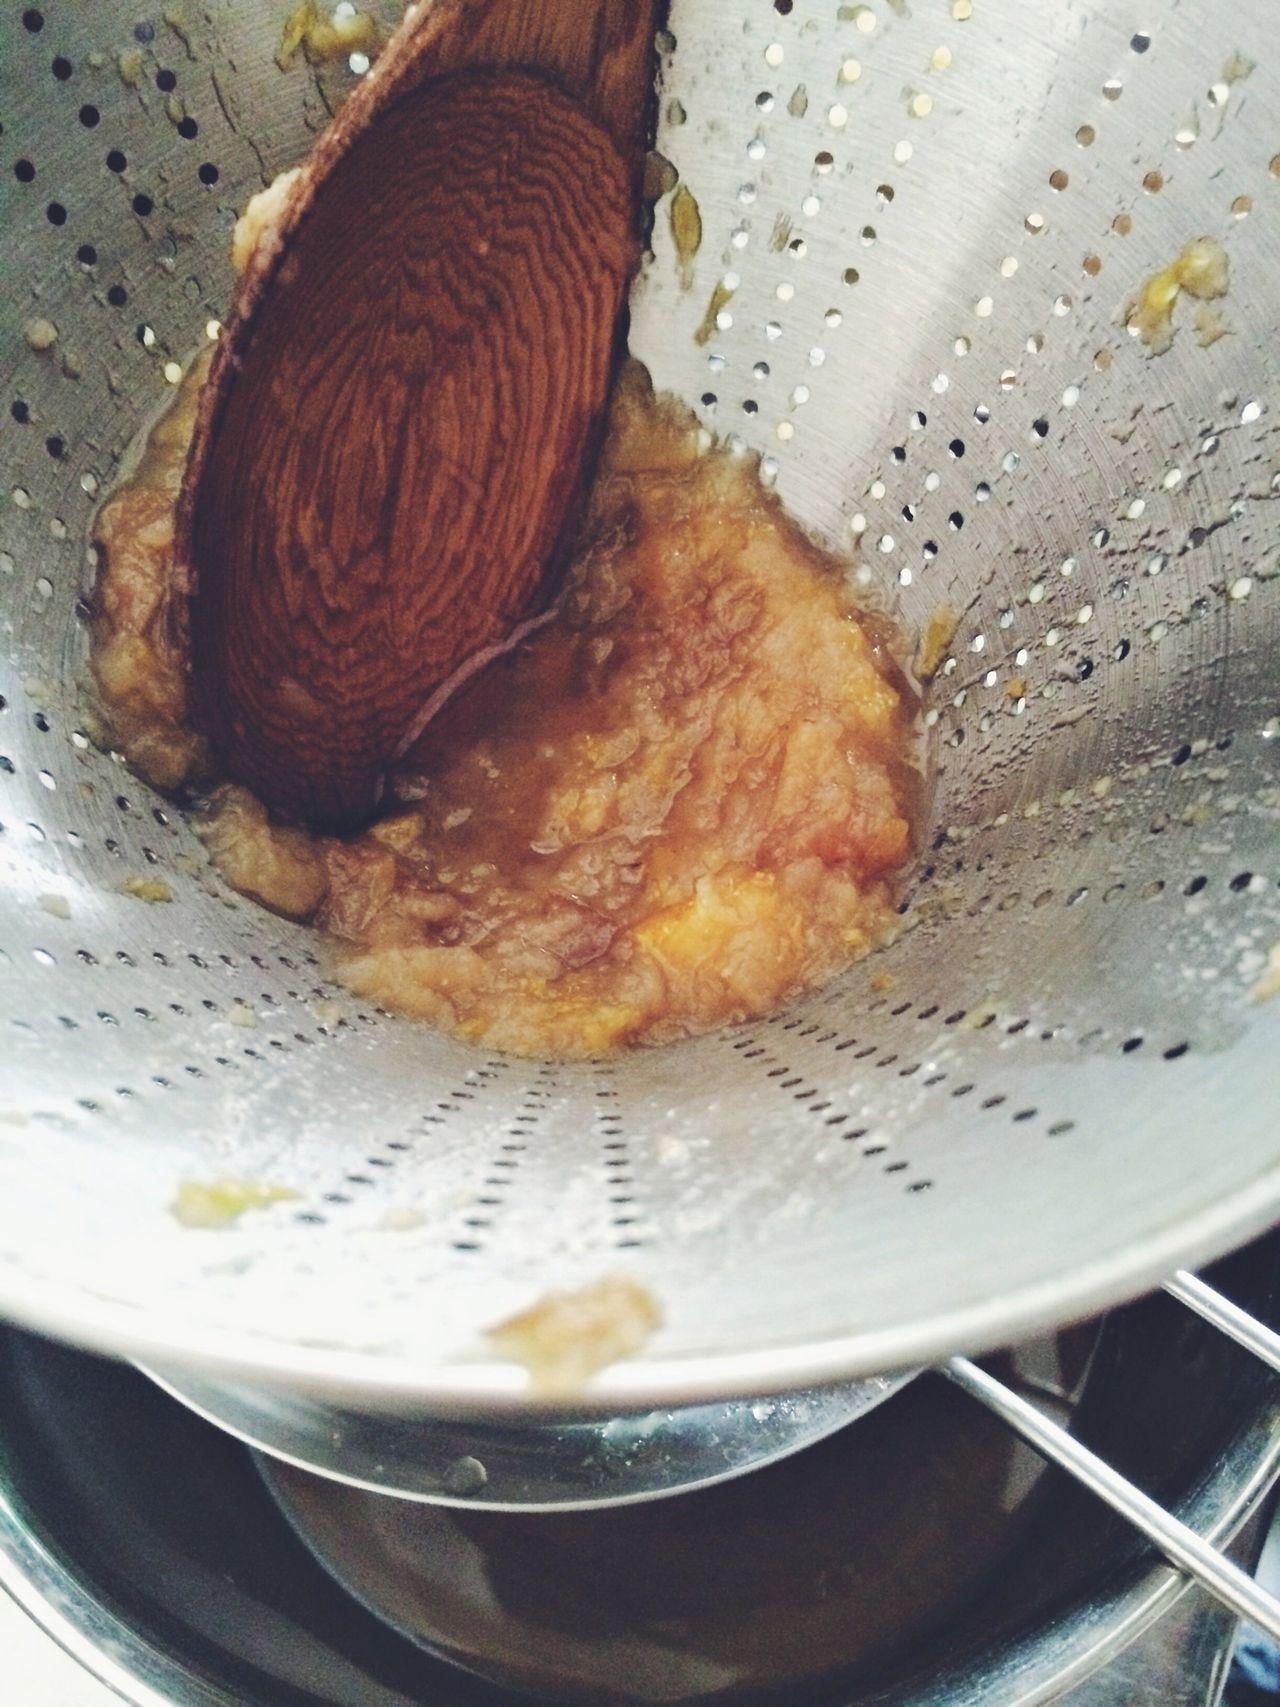 Beautiful stock photos of kitchen, Cooking, Creativity, Filter, Focus